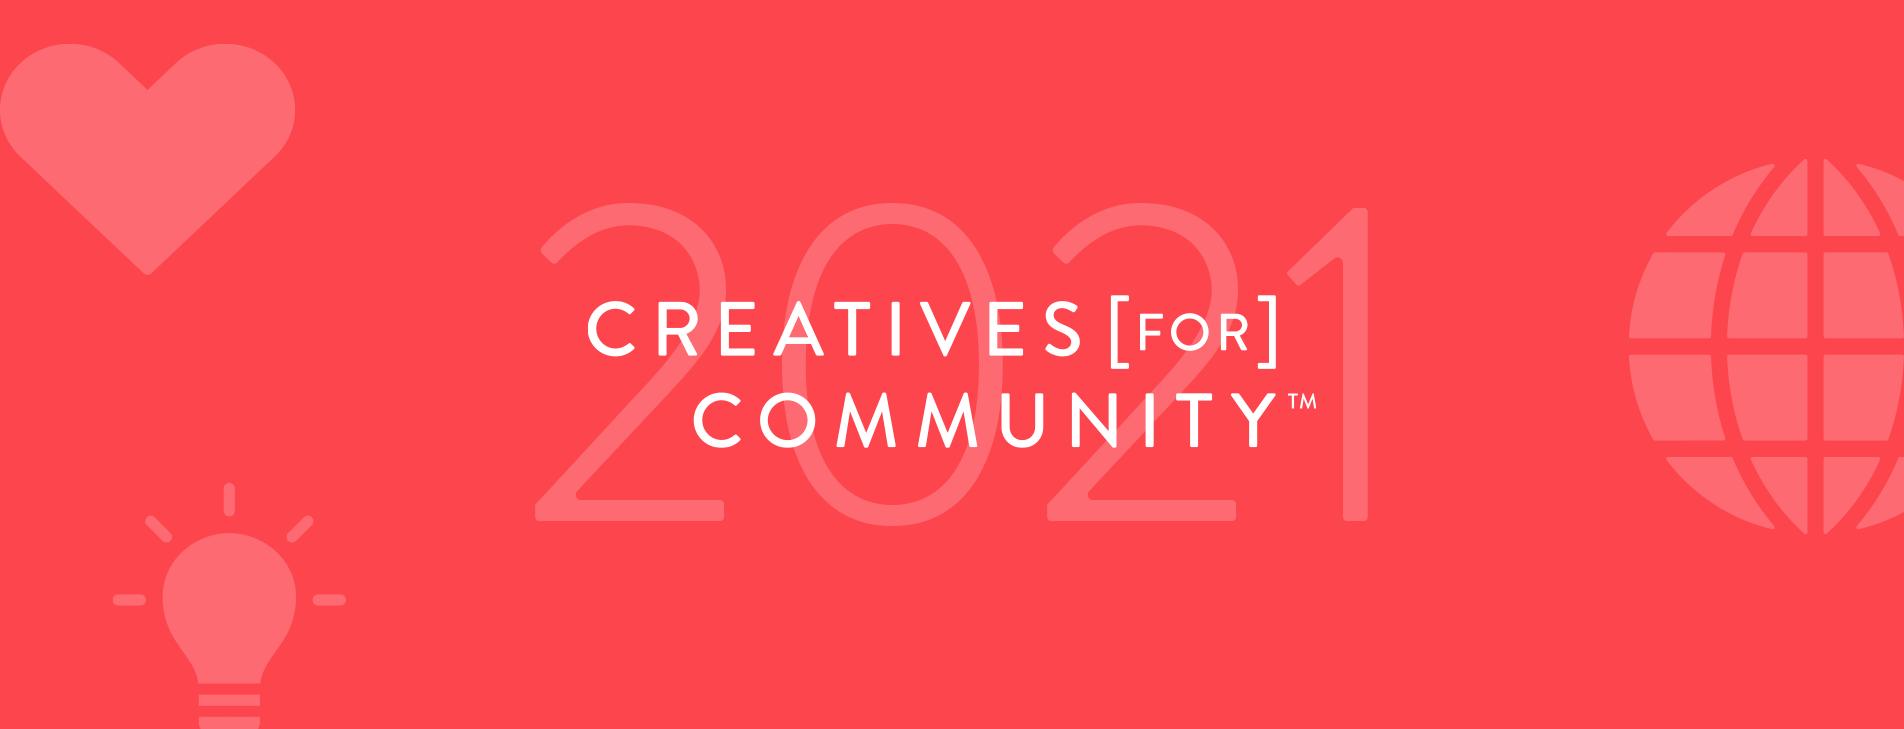 creatives4community-2021-header